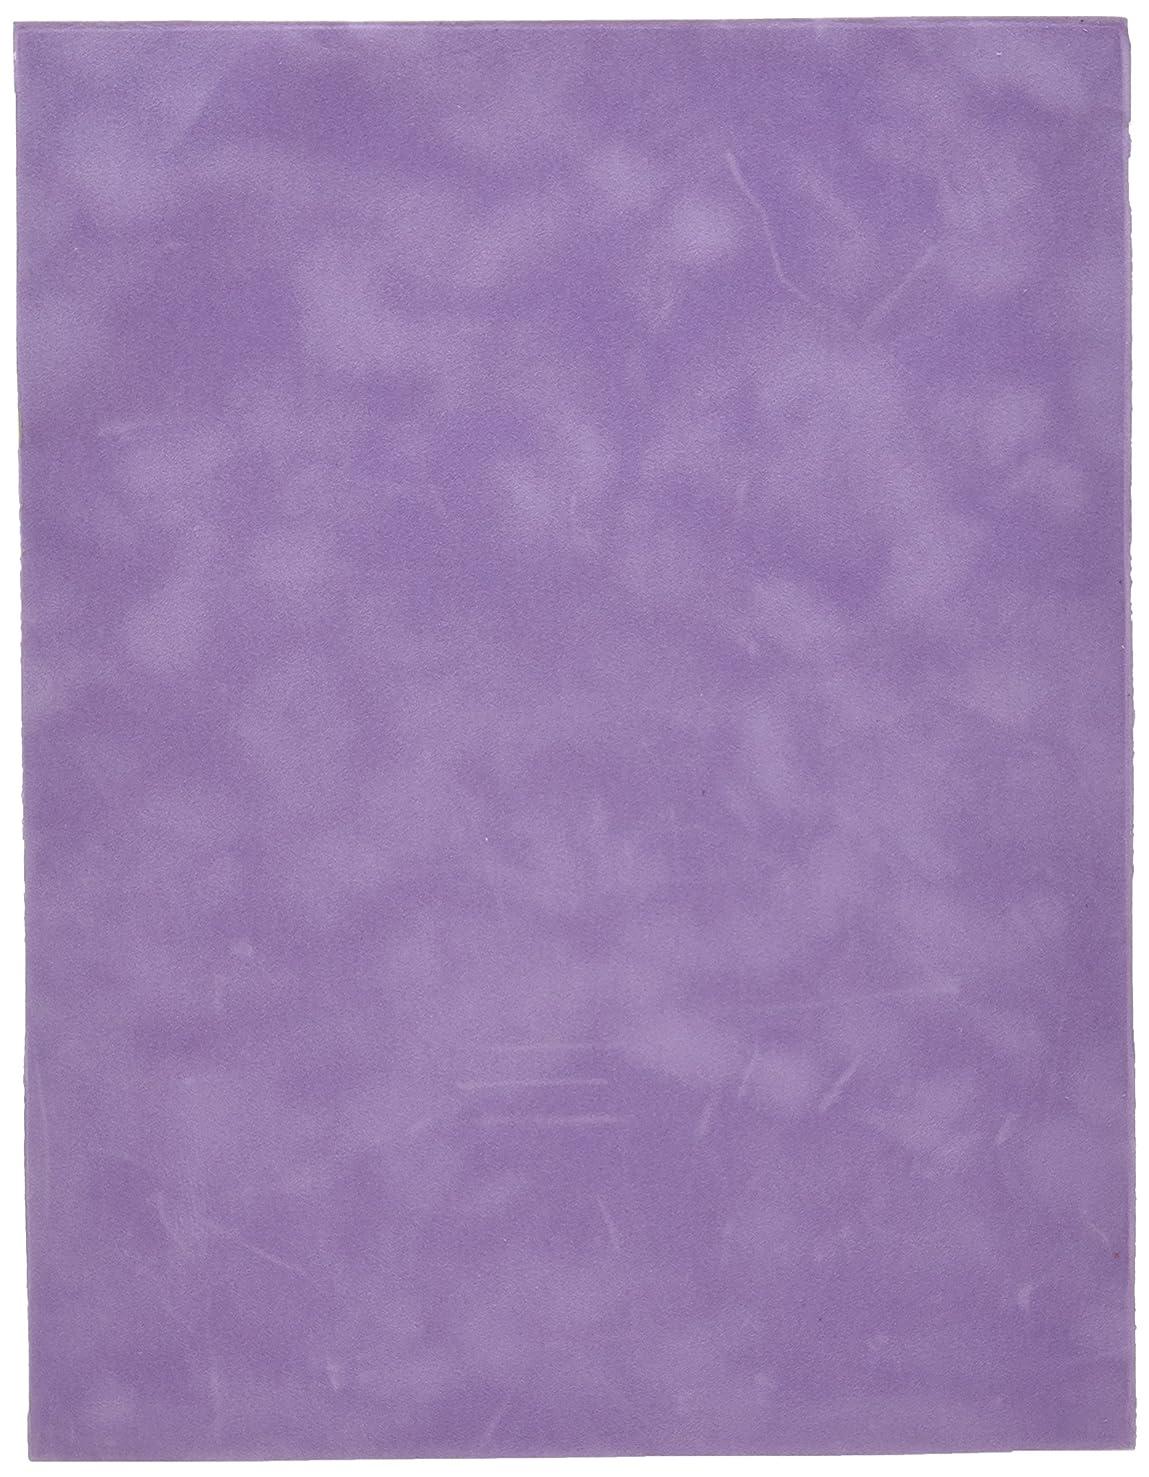 Sew Easy Industries 12-Sheet Velvet Paper, 8.5 by 11-Inch, Lavender